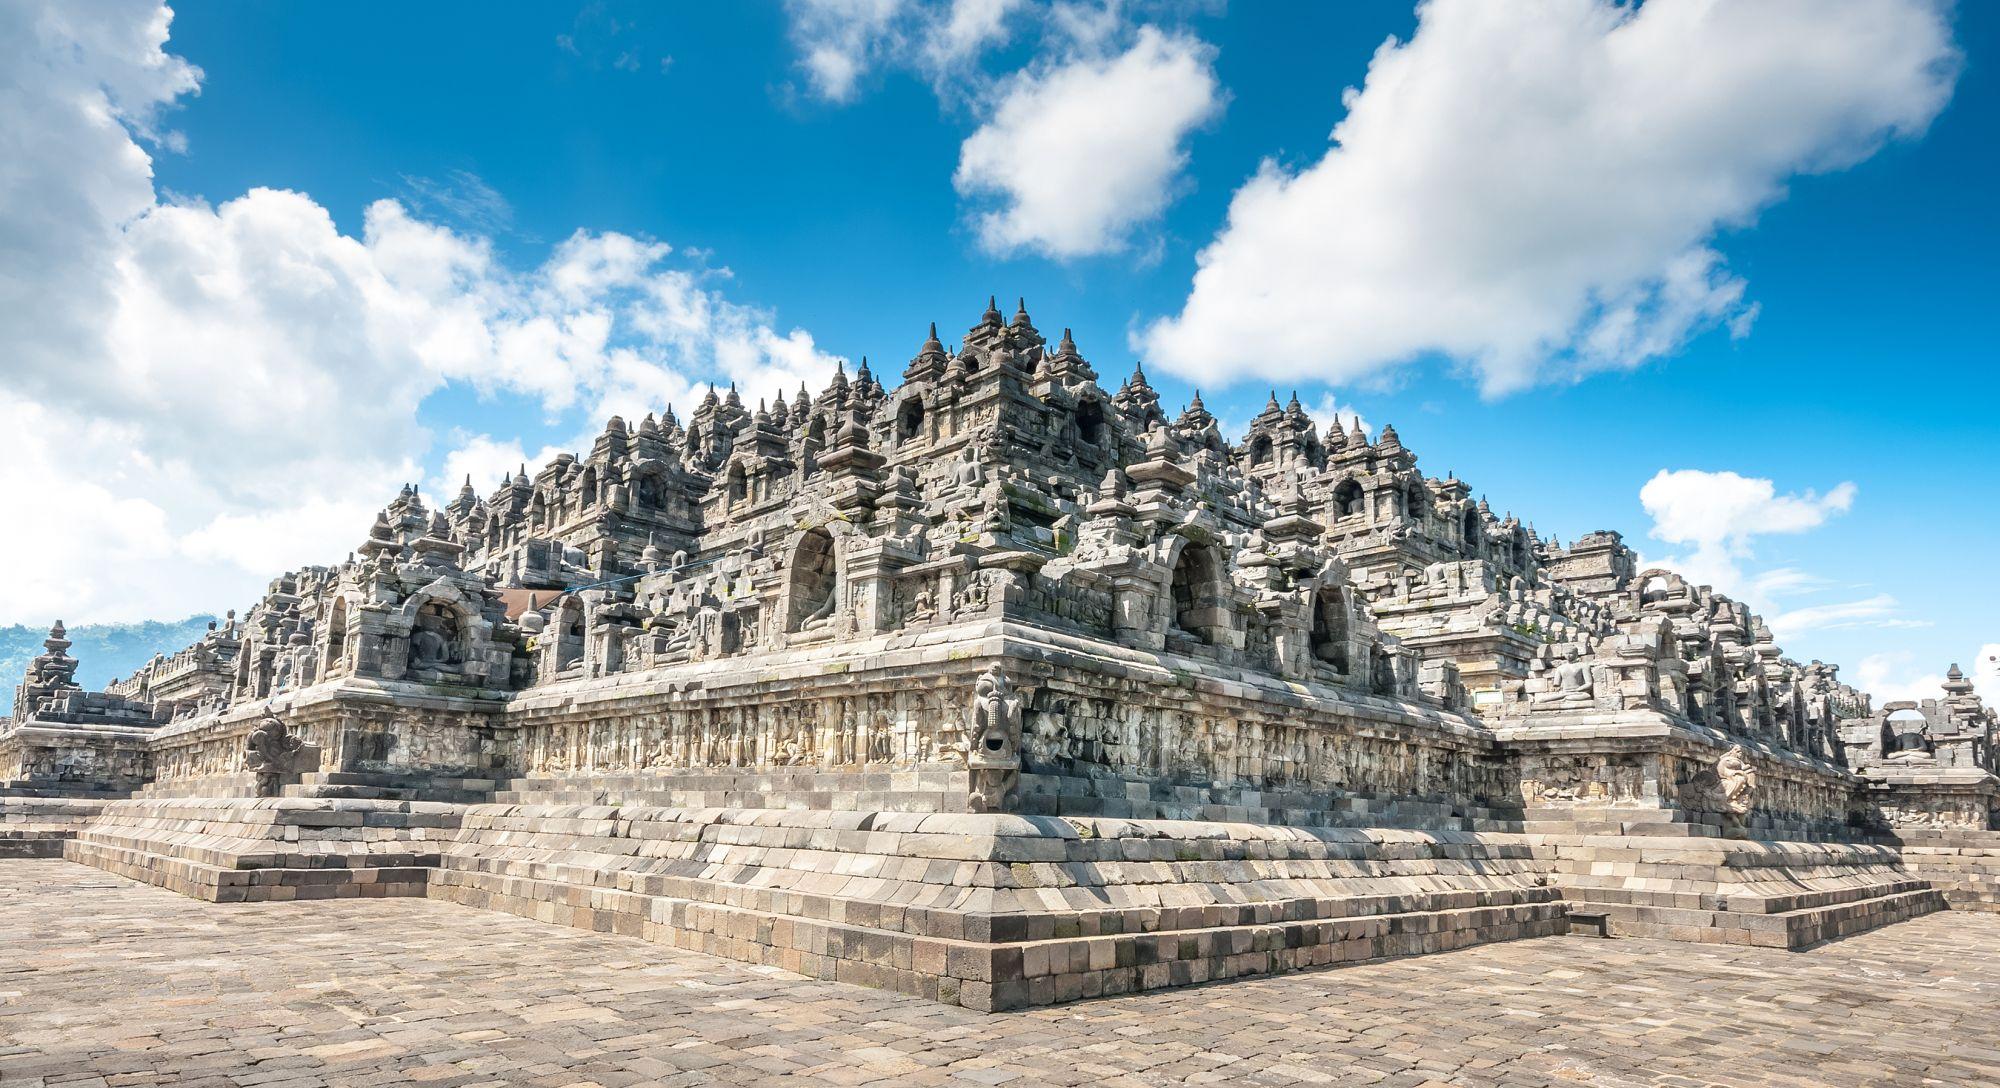 Indonesie Borobudur tempel Jogjakarta